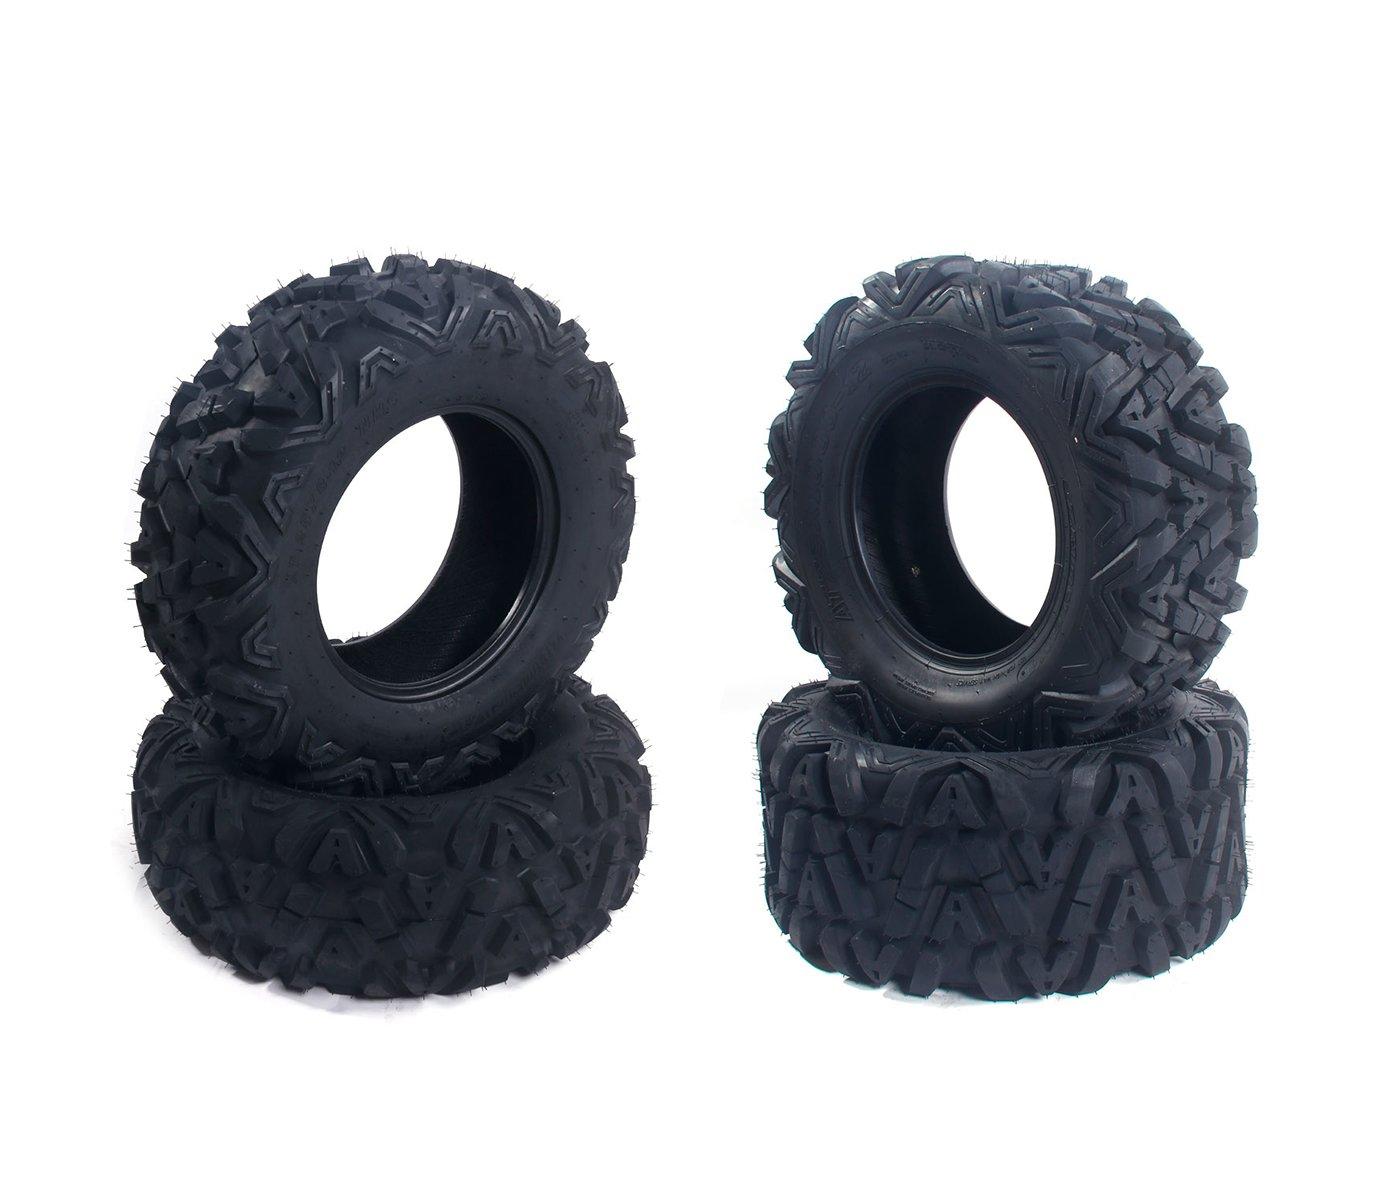 4PCS ATV/UTV Tires Set 25x8-12 Front & 25X10-12 Rear 6Ply